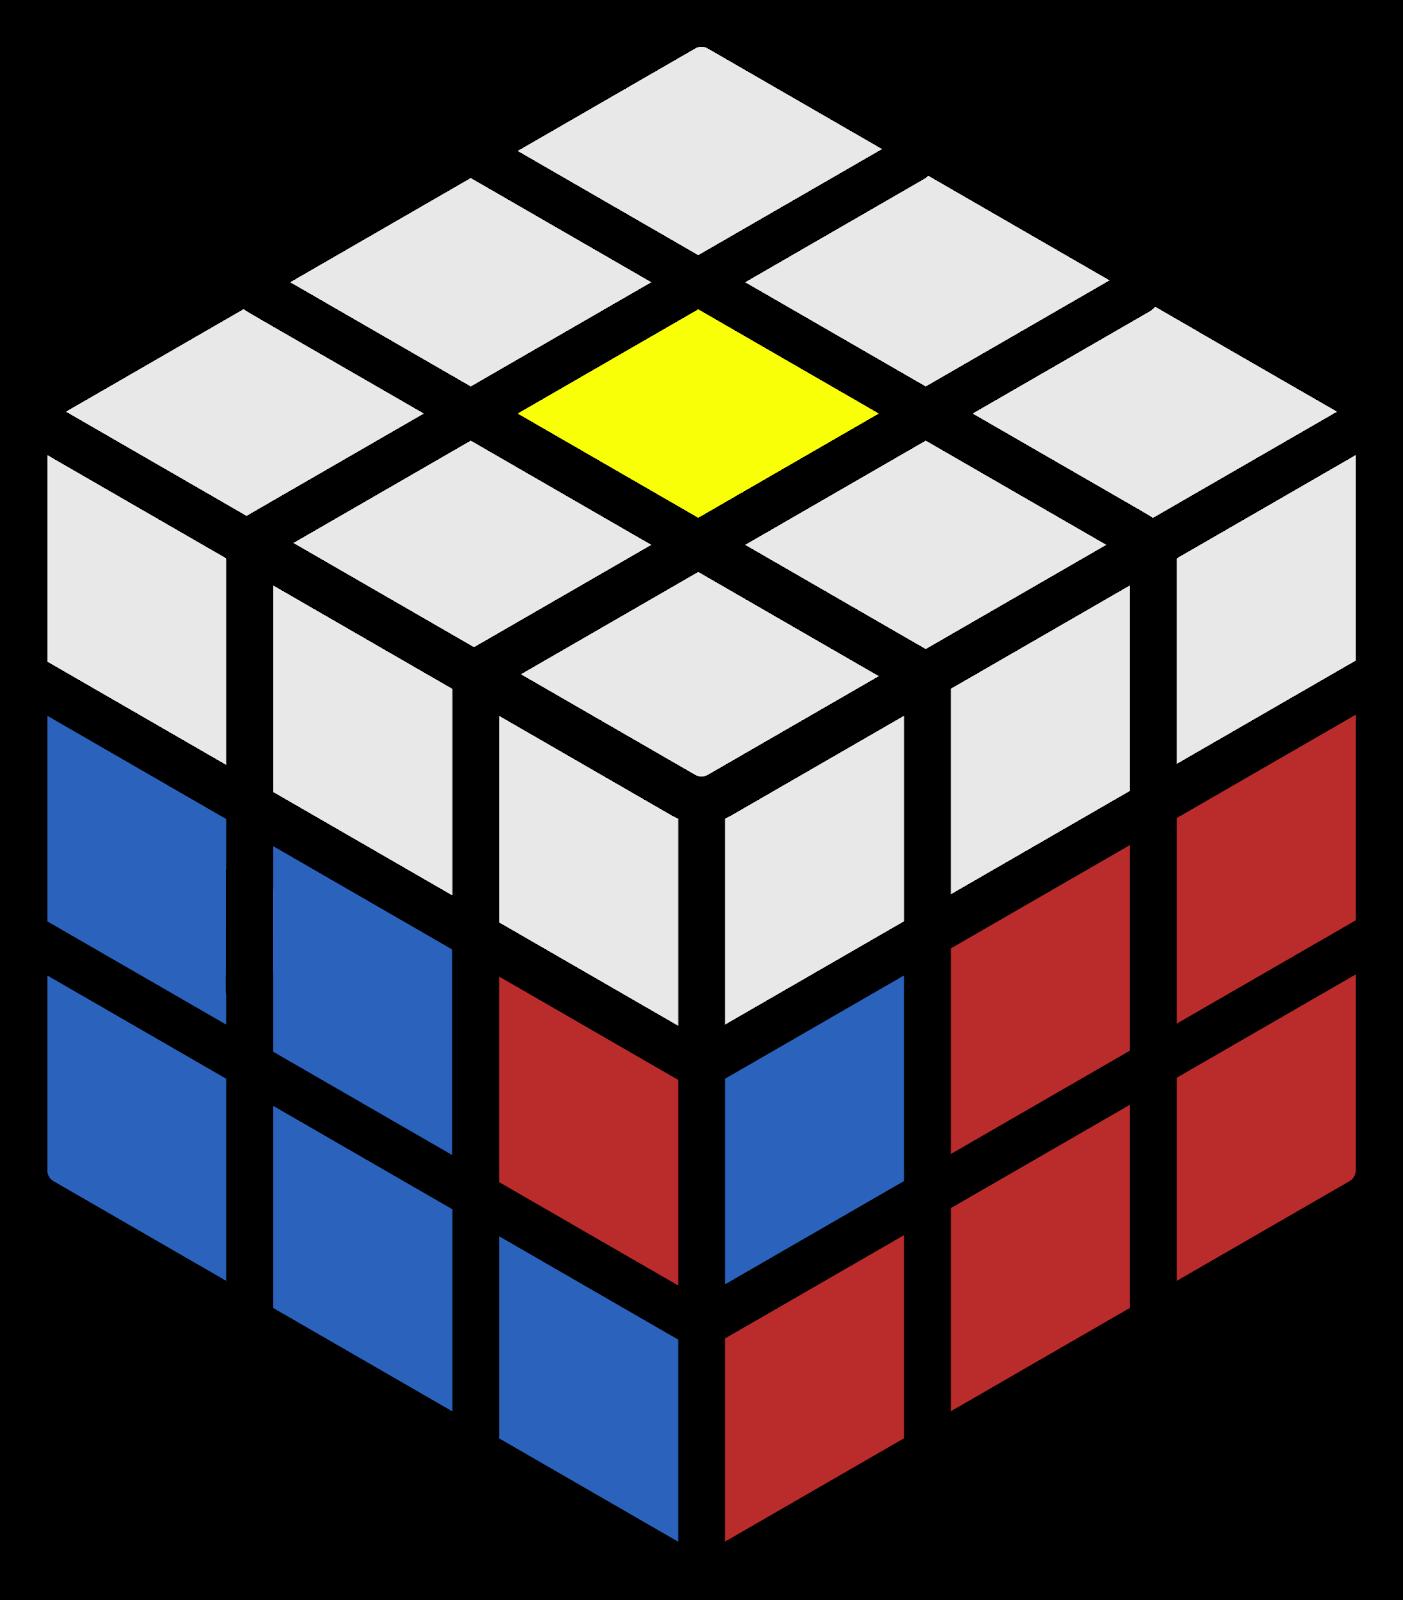 rumus middle layer rubik 3x3 3